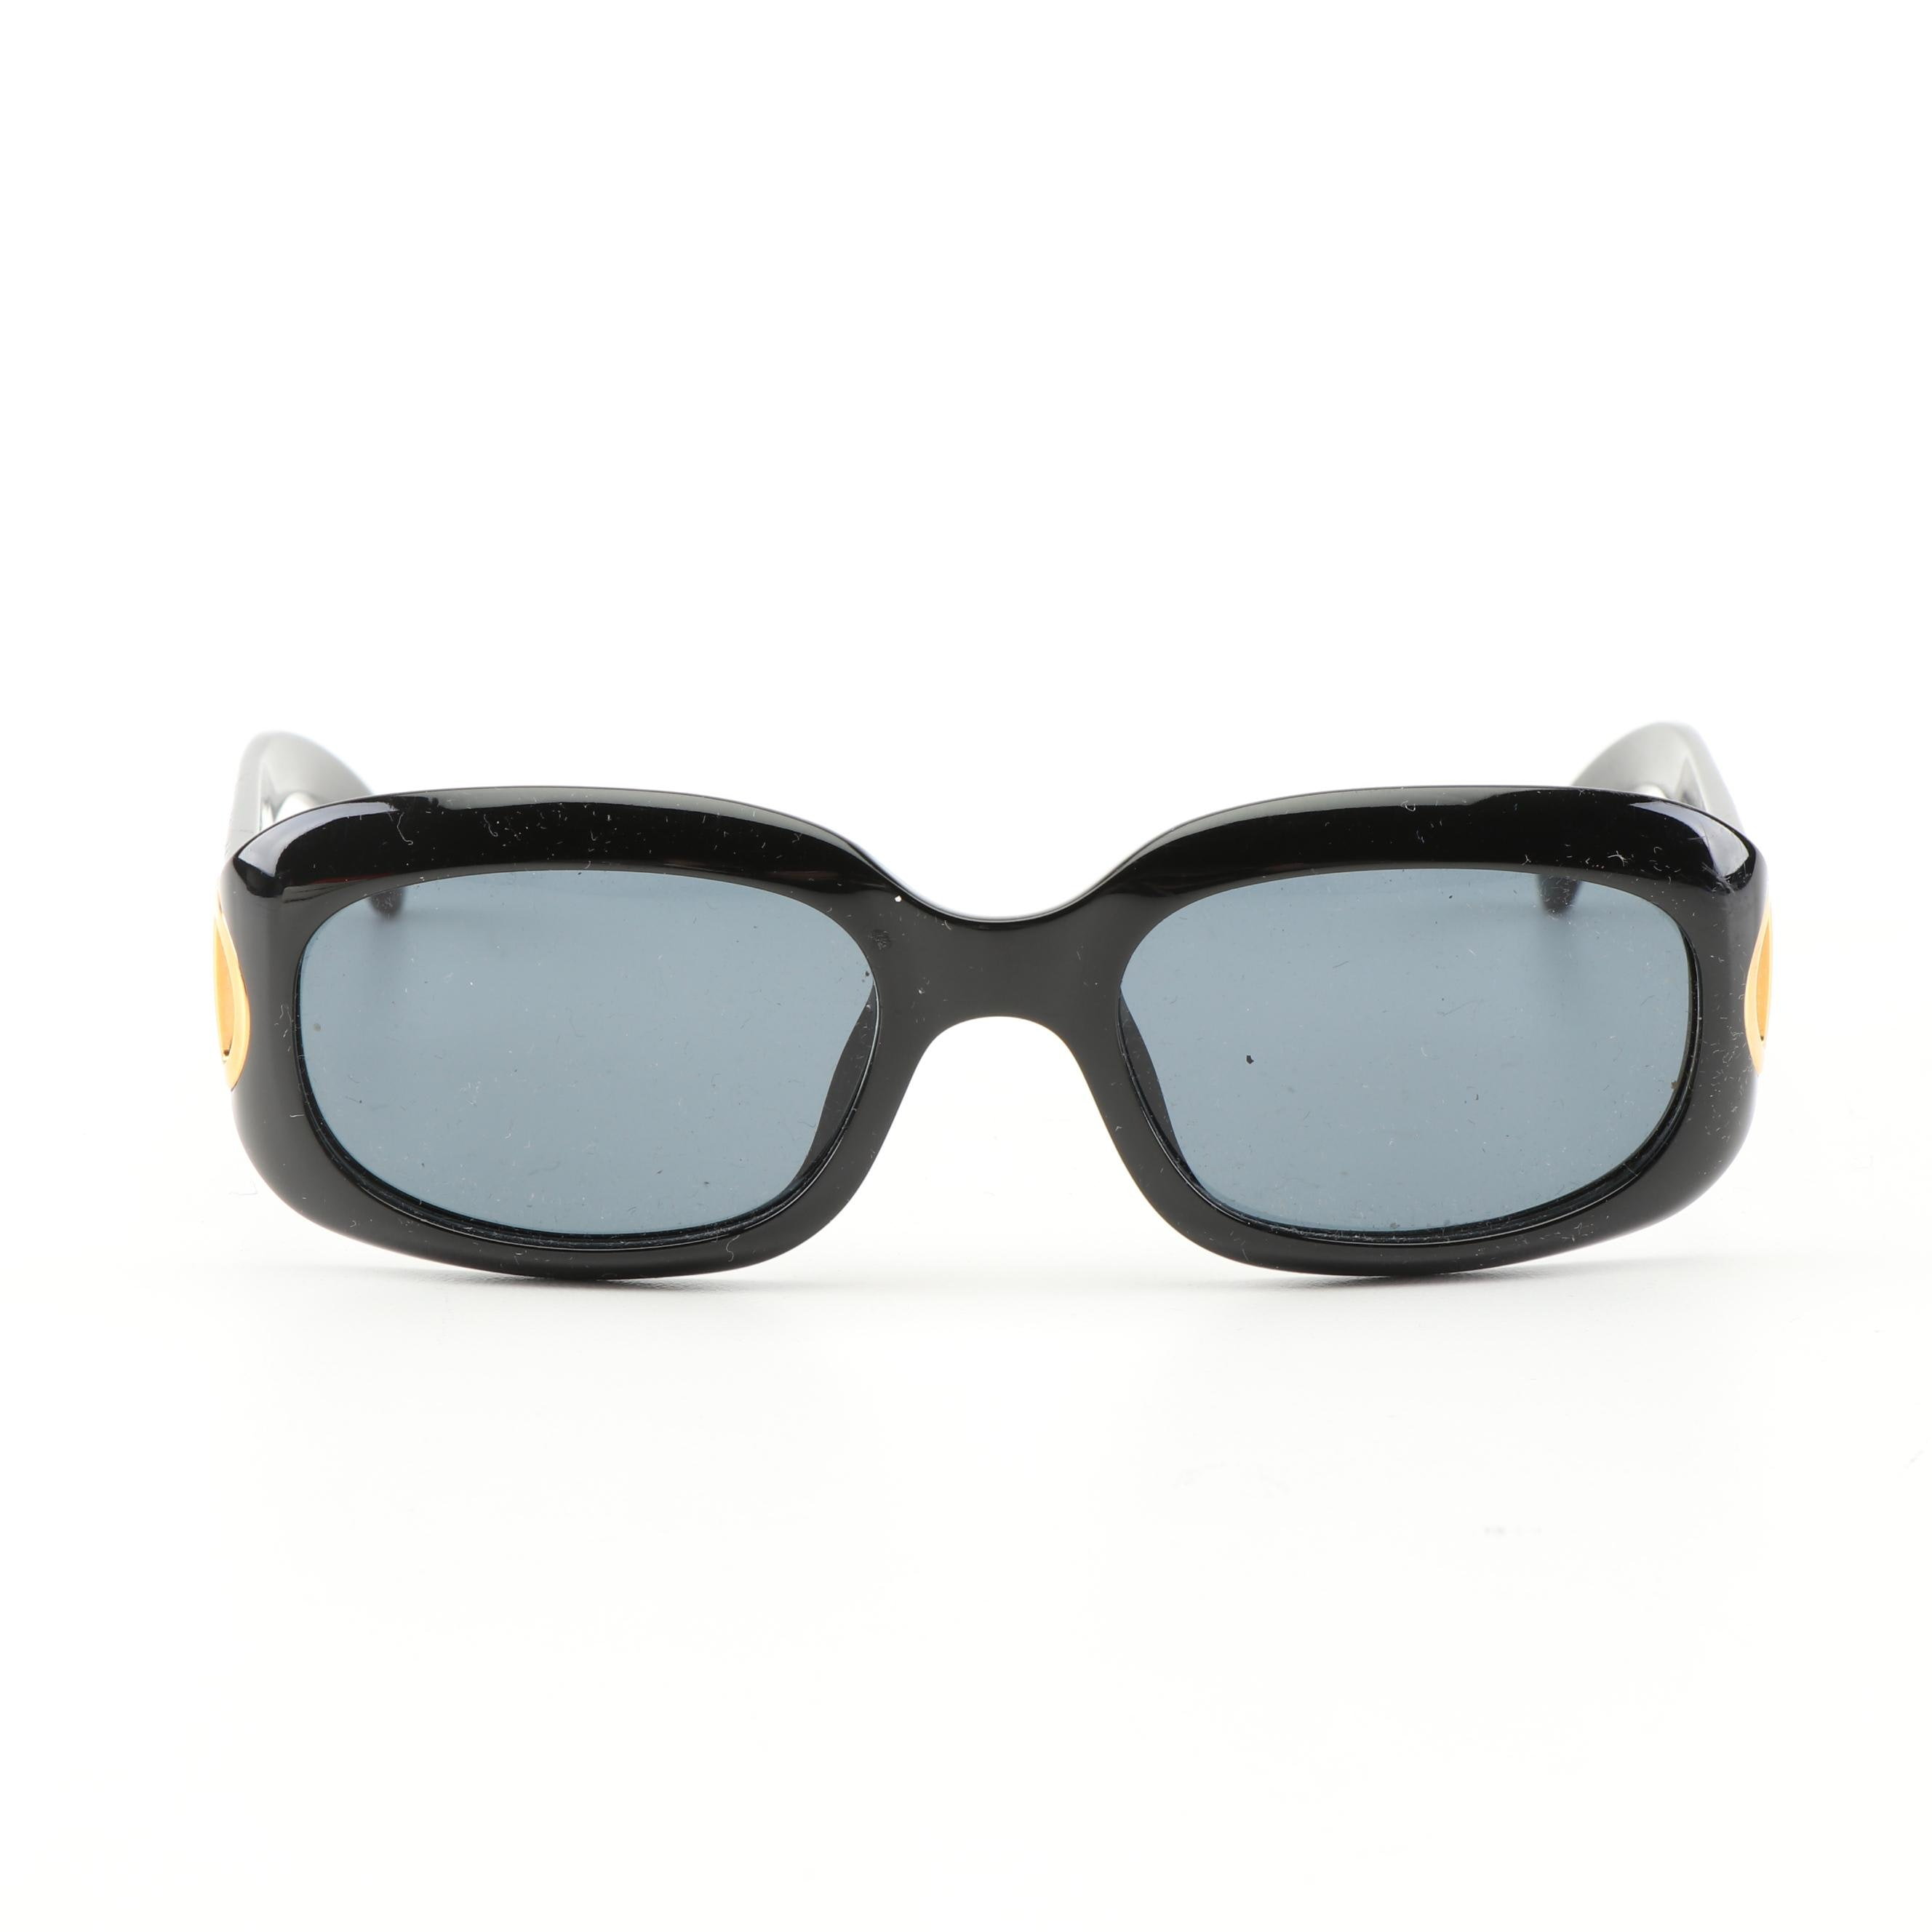 Christian Dior Isadiora Black Sunglasses